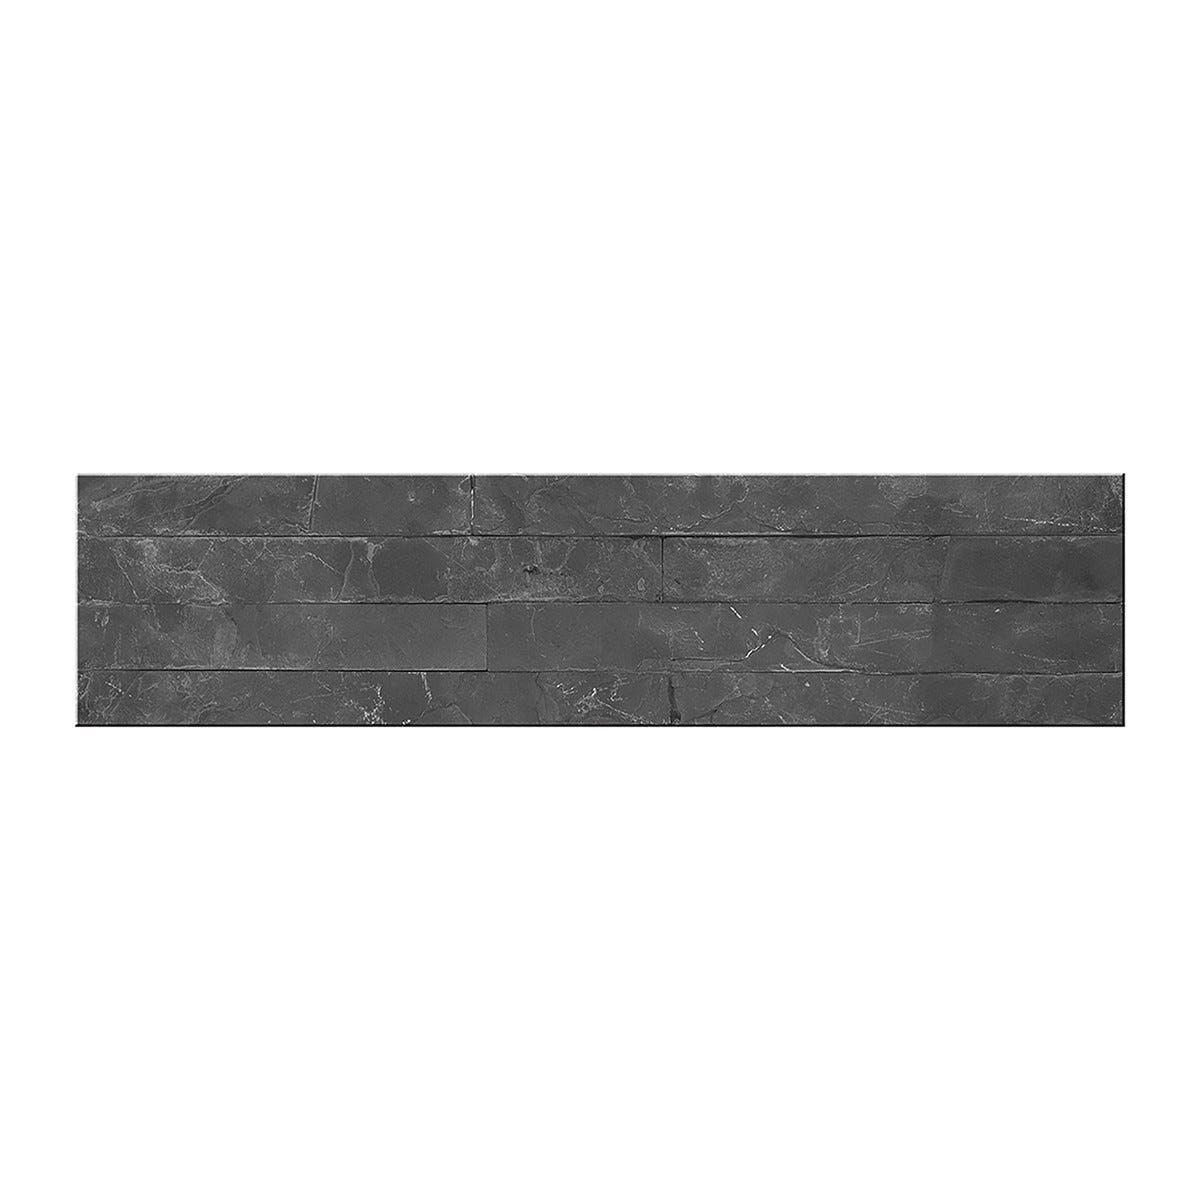 ACCADEMIA_61 Placchetta Pietra Naturale Nera 10x40cm 12 Pezzi 4 Liste